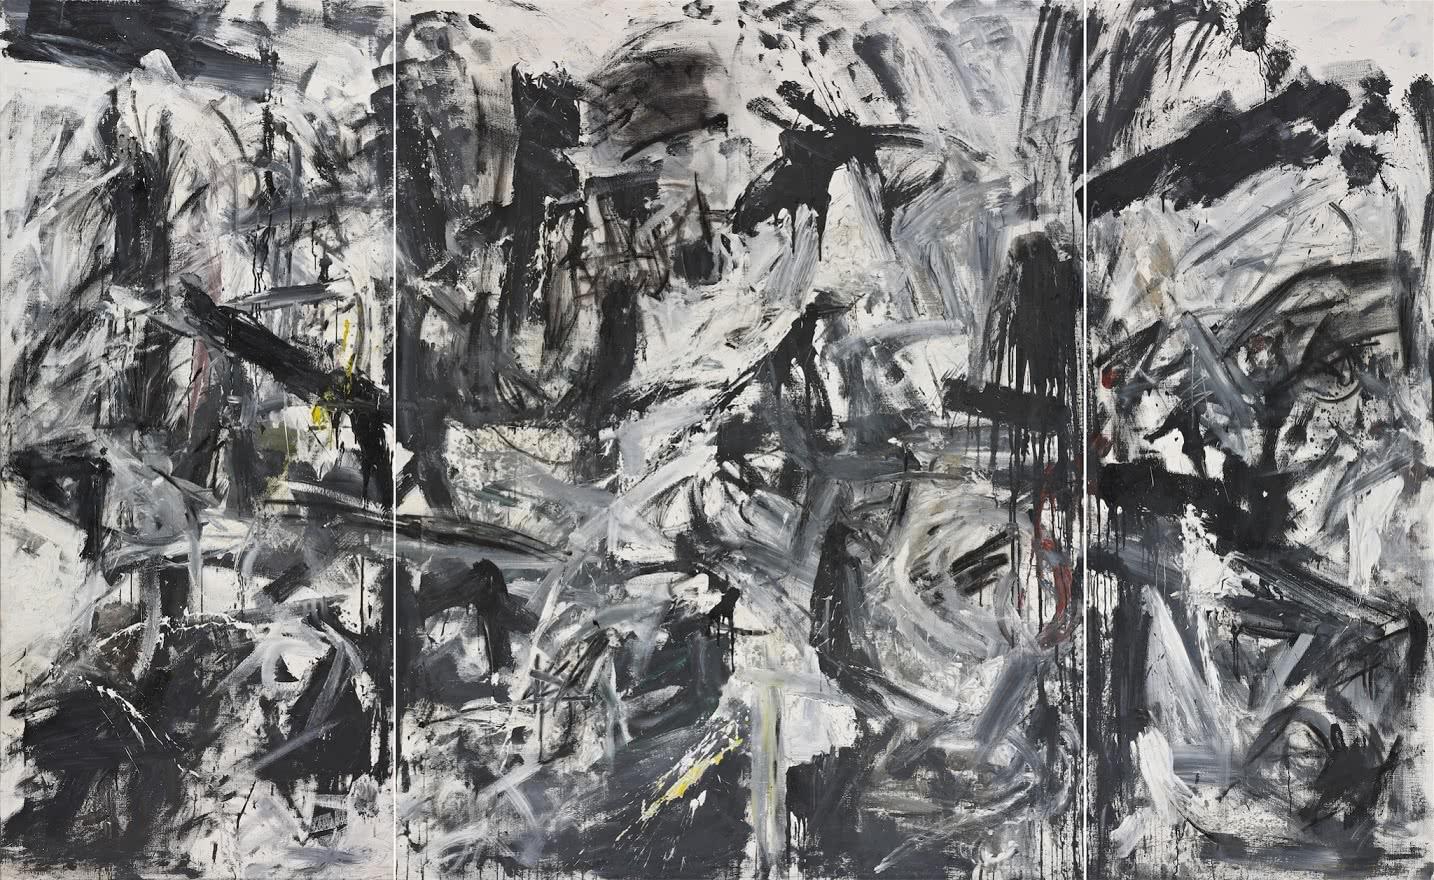 Emilio Vedova. Scontro di Situazioni '59-I-1 (Choque de situaciones '59-I-1). 1959. Fondation Gandur pour l'Art, Ginebra. Foto: Sandra Pointet.